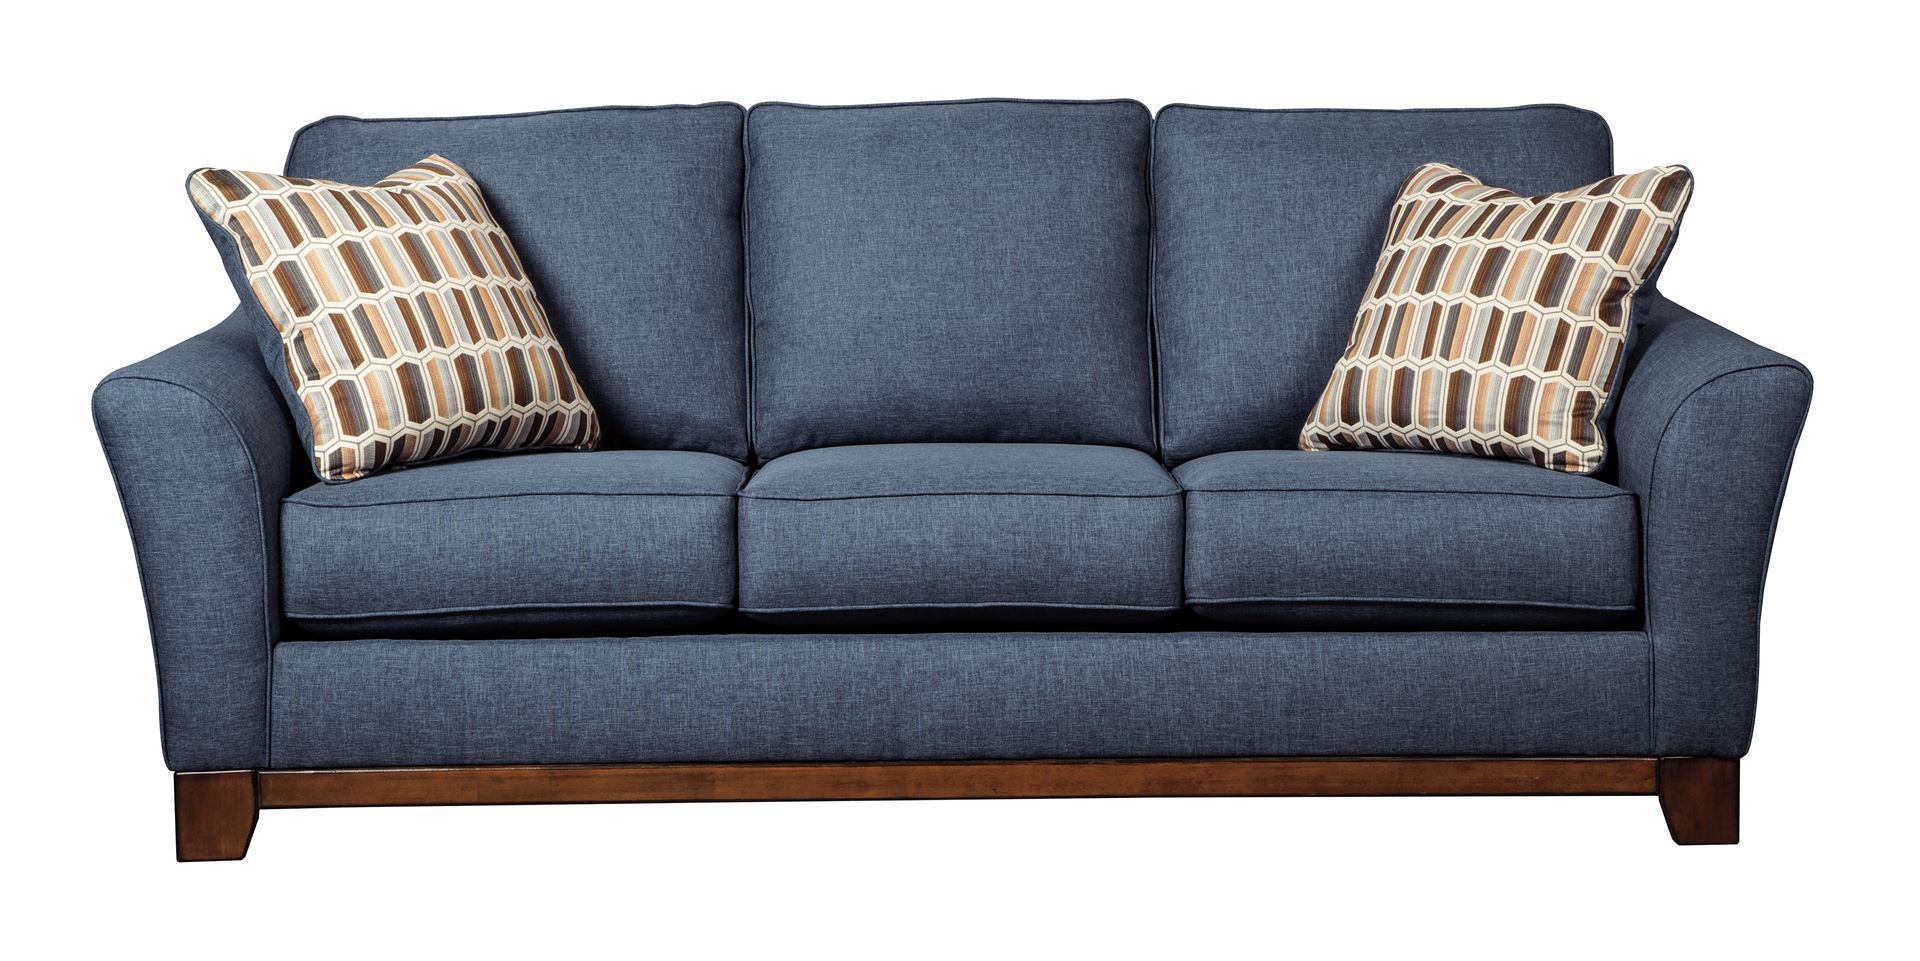 Furniture sofa set janley sofa set hauslife furniture e gest online in LPEOTSJ